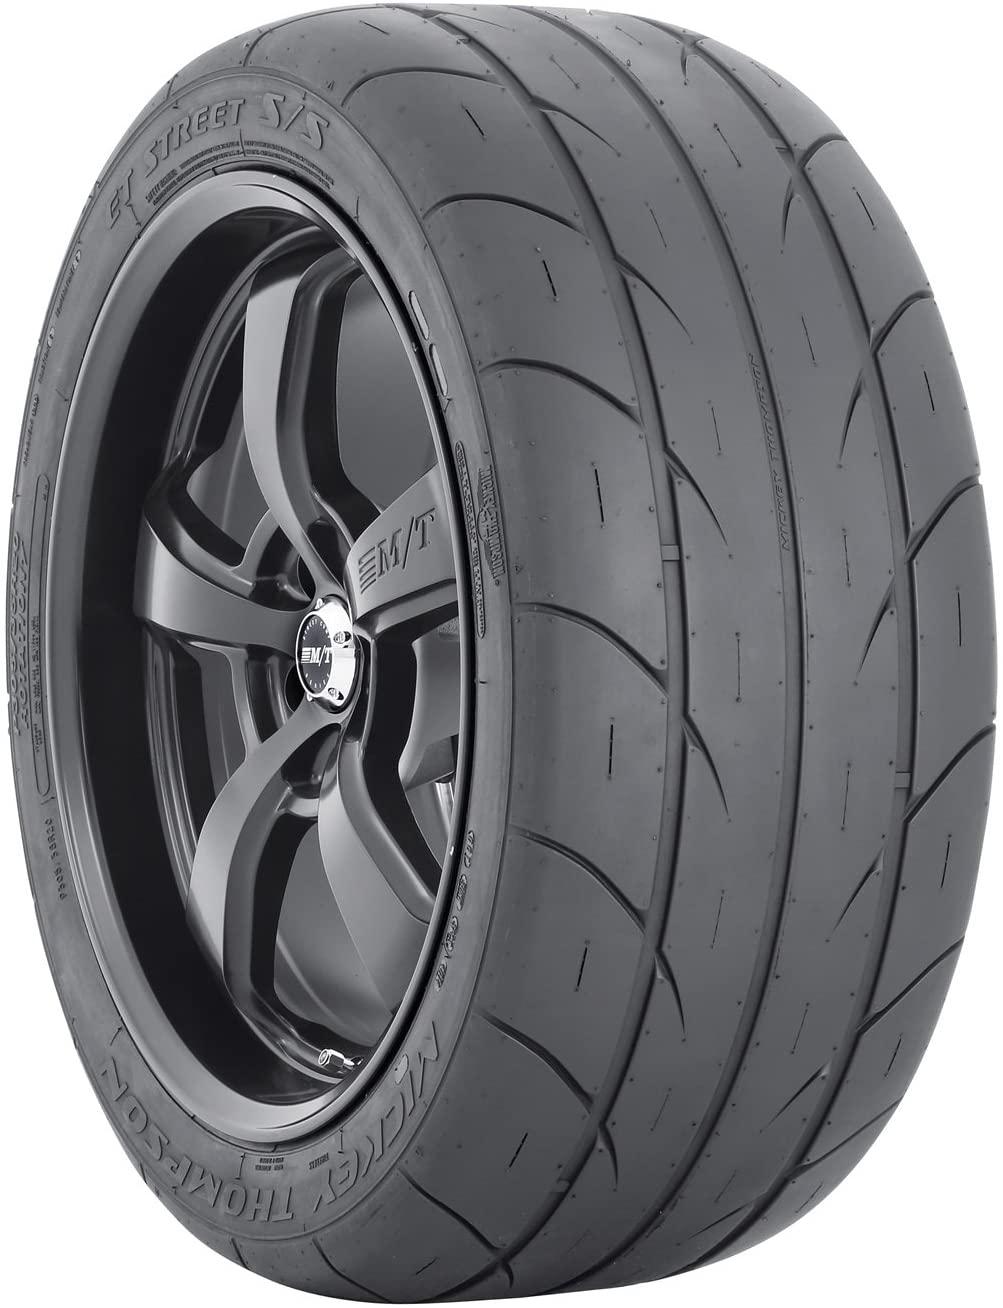 Mickey Thompson ET Street S/S Racing Radial Tire - P285/40R18